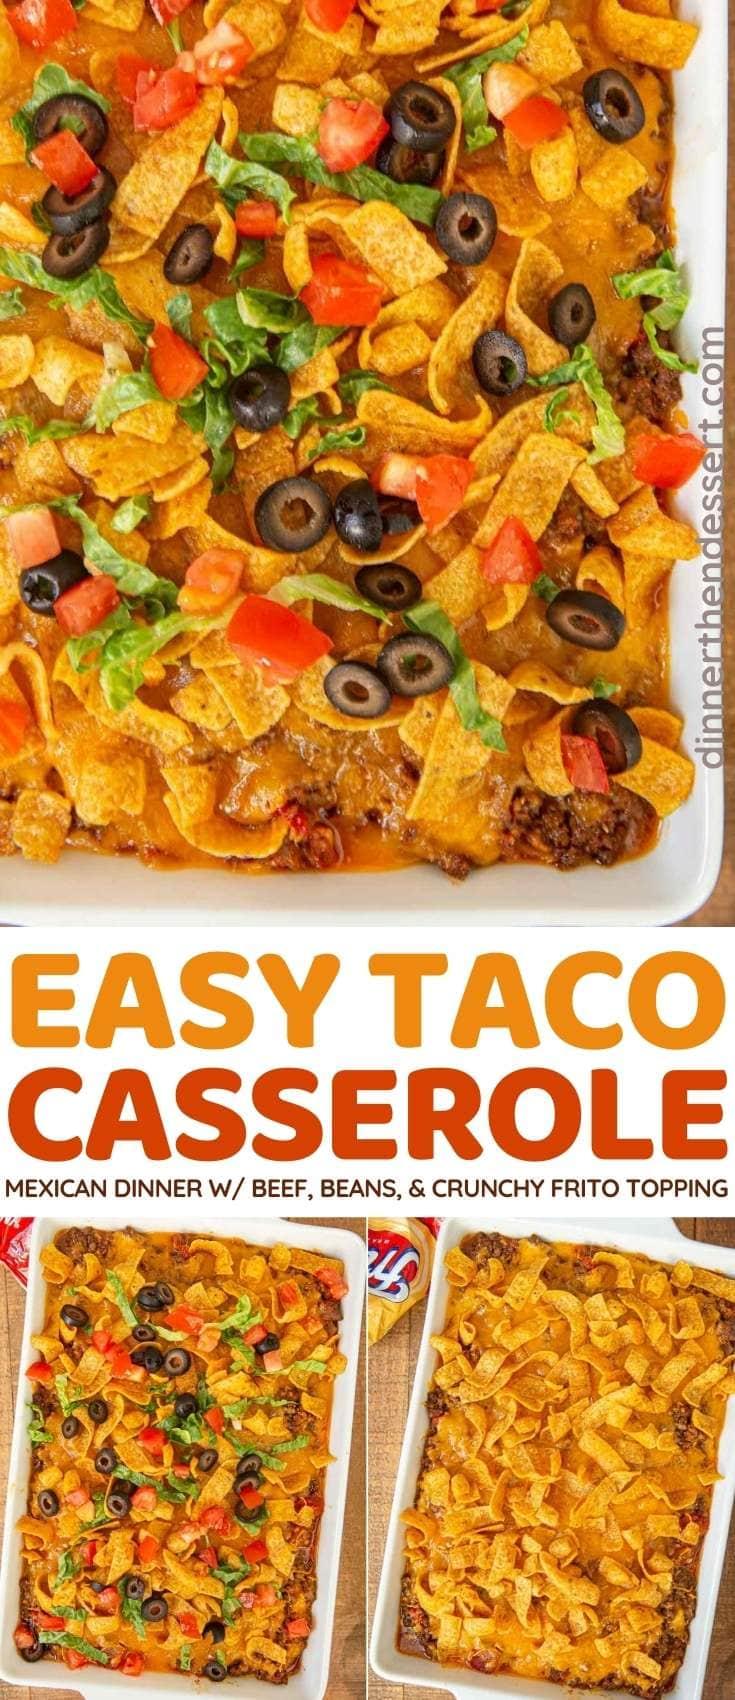 Taco Casserole collage